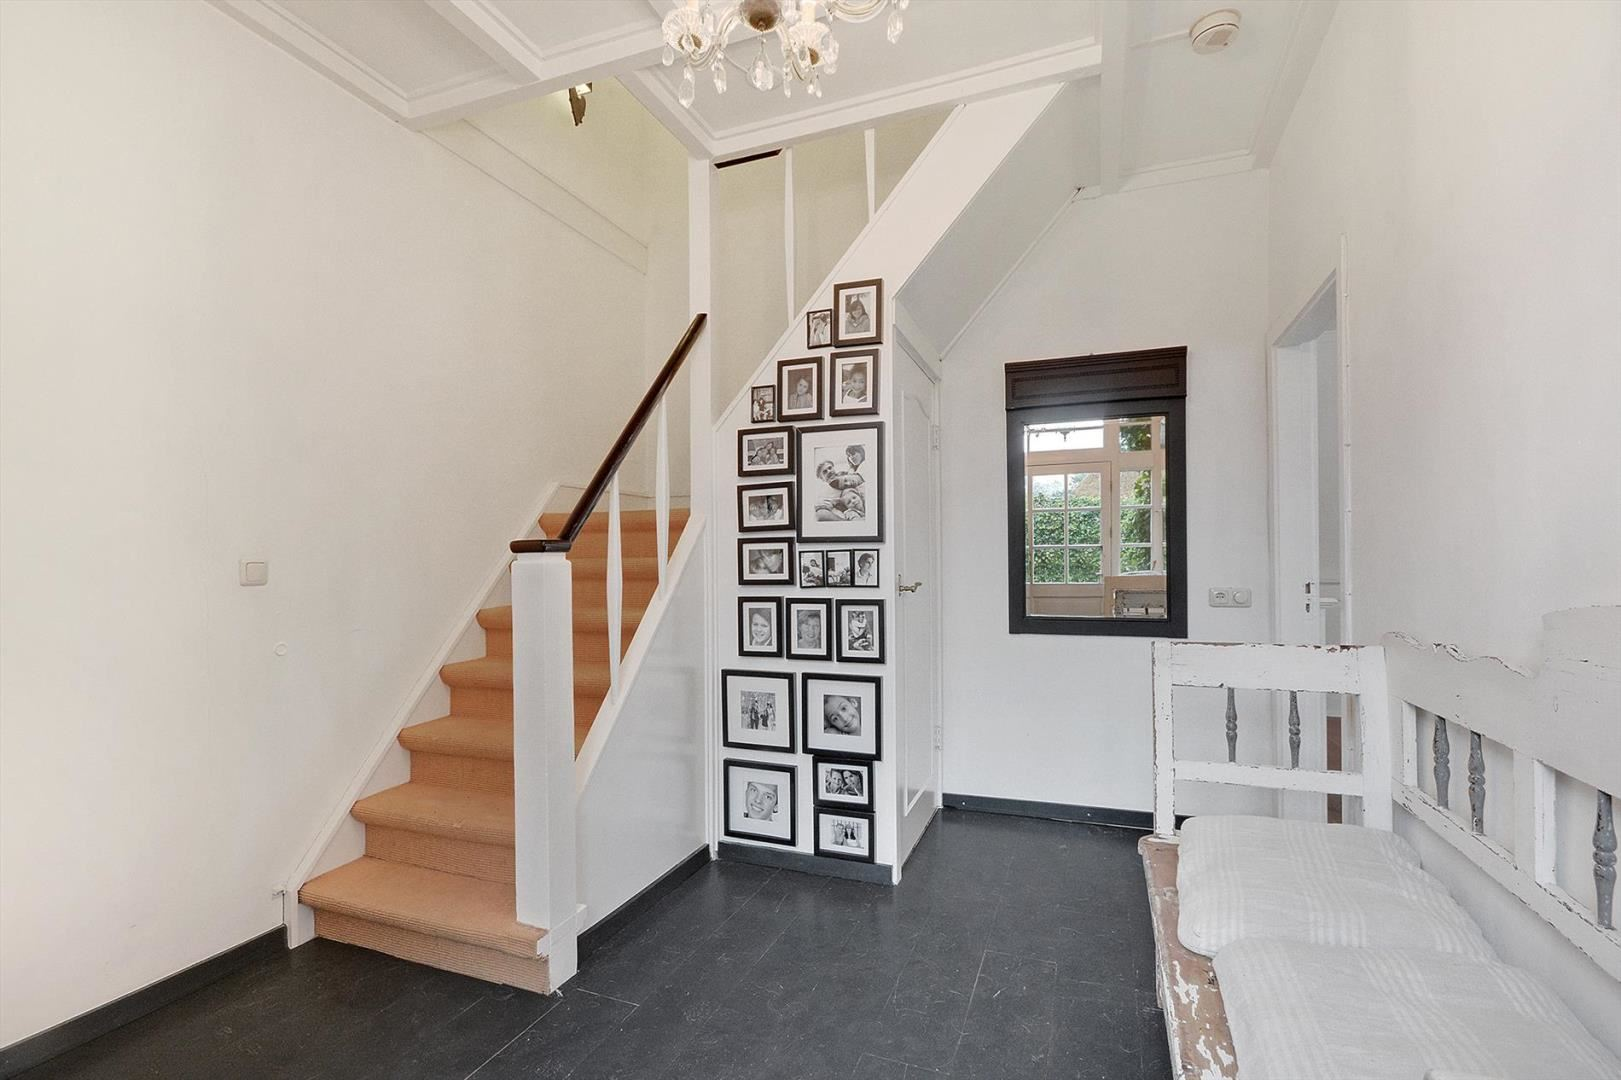 коридор скамейка лестница рамки фото картины